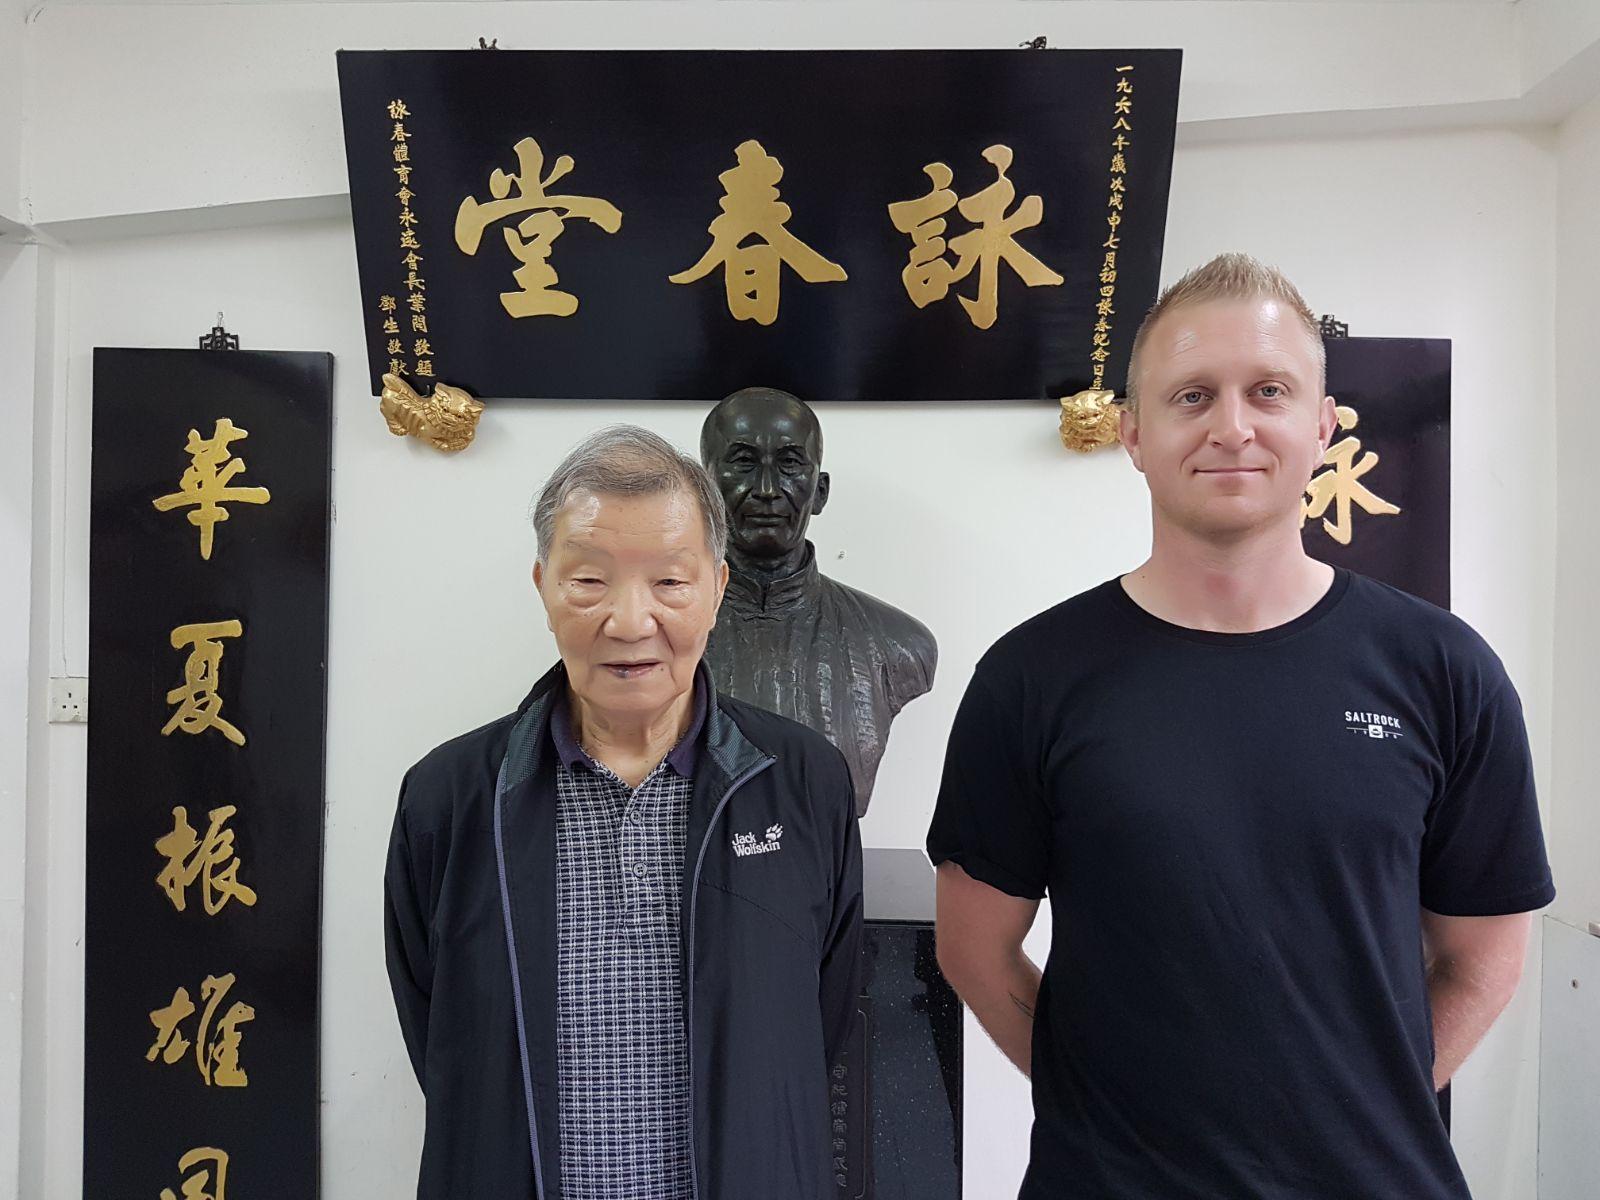 Robert Ley with GM Ip Ching (son of Ip Man) in the Ving Tsun Athletic Association Hong Kong